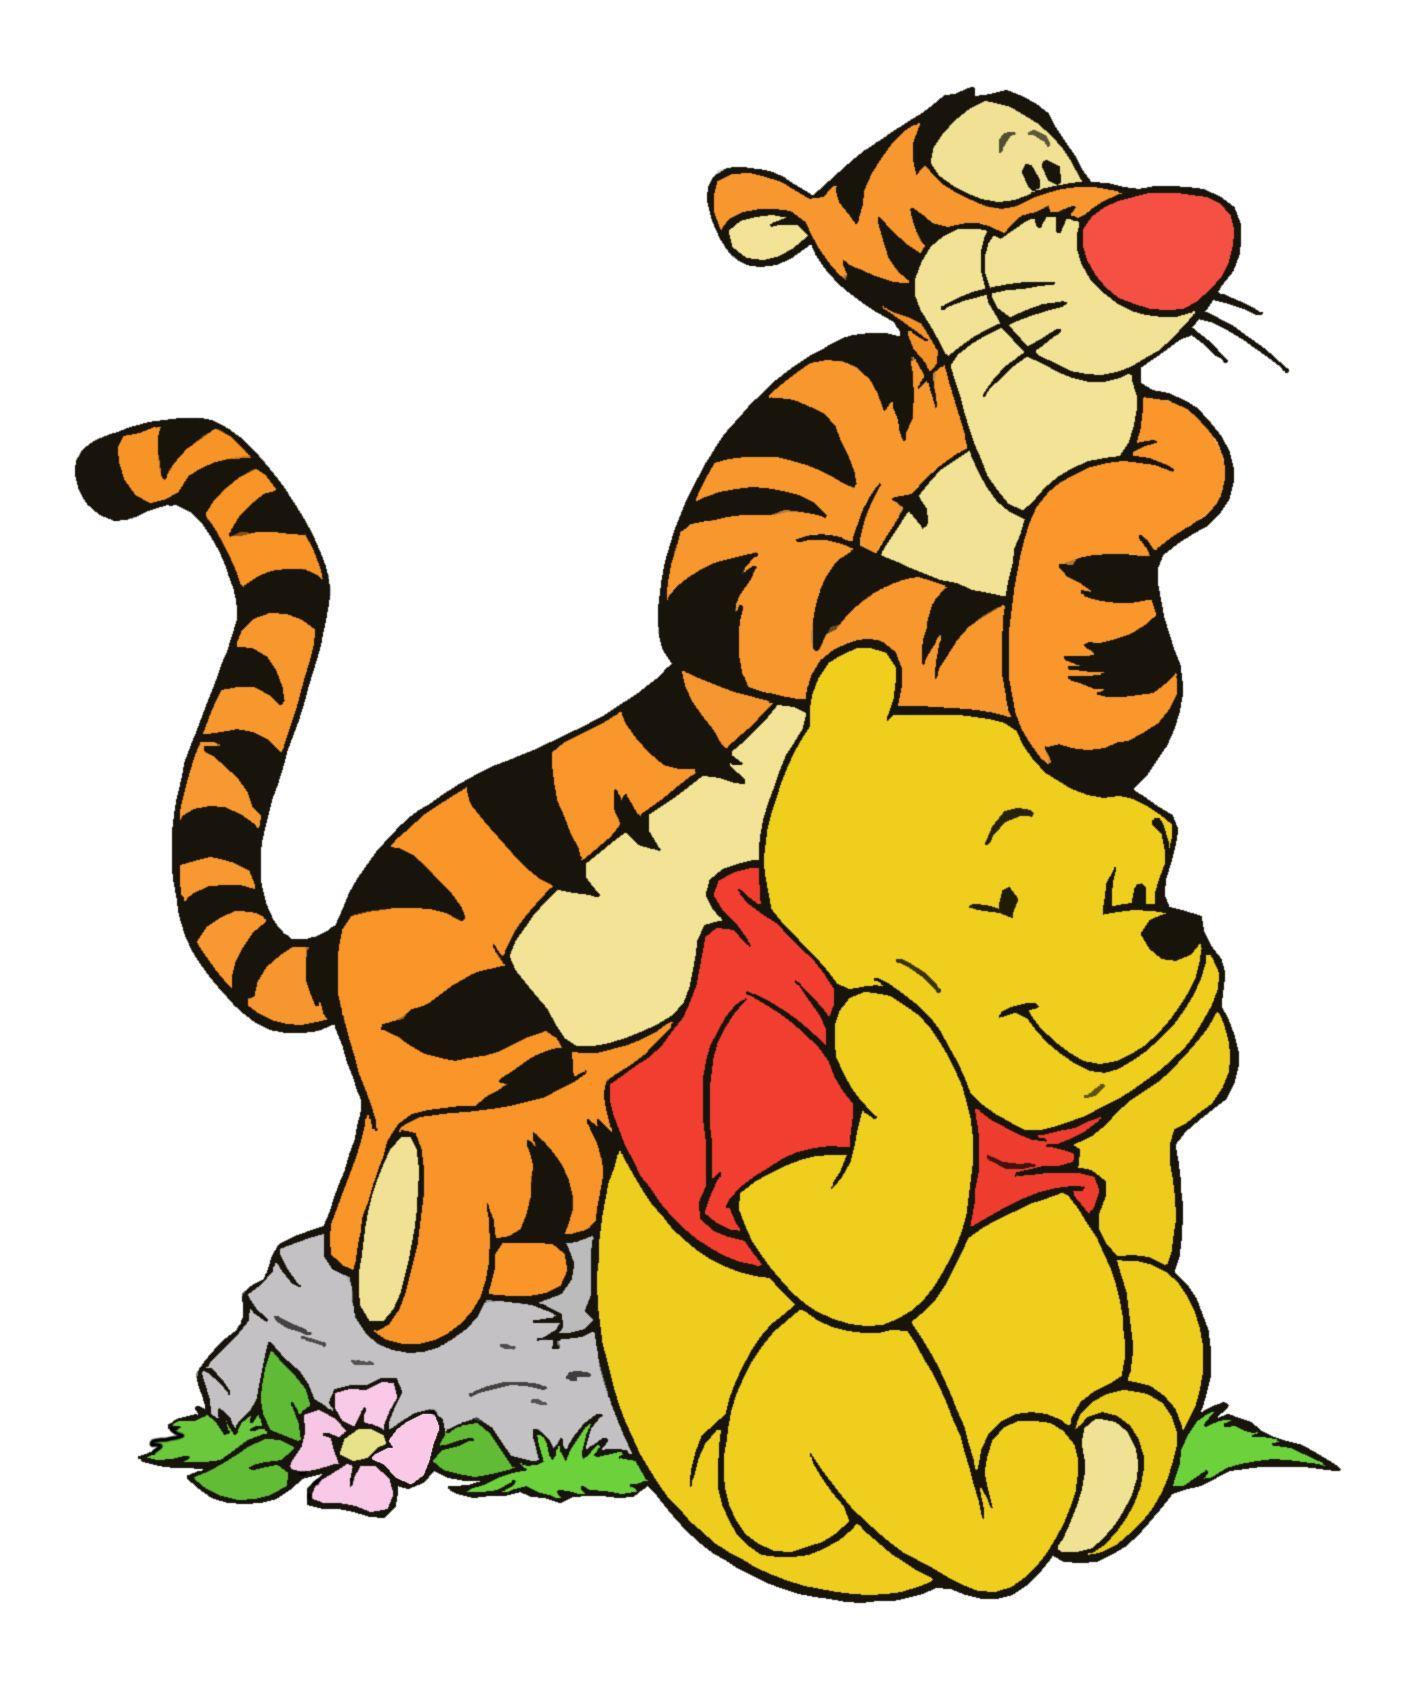 Pin By Martha E Velasco A On Cameo Silhouet Tigger And Pooh Tigger Winnie The Pooh Winnie The Pooh